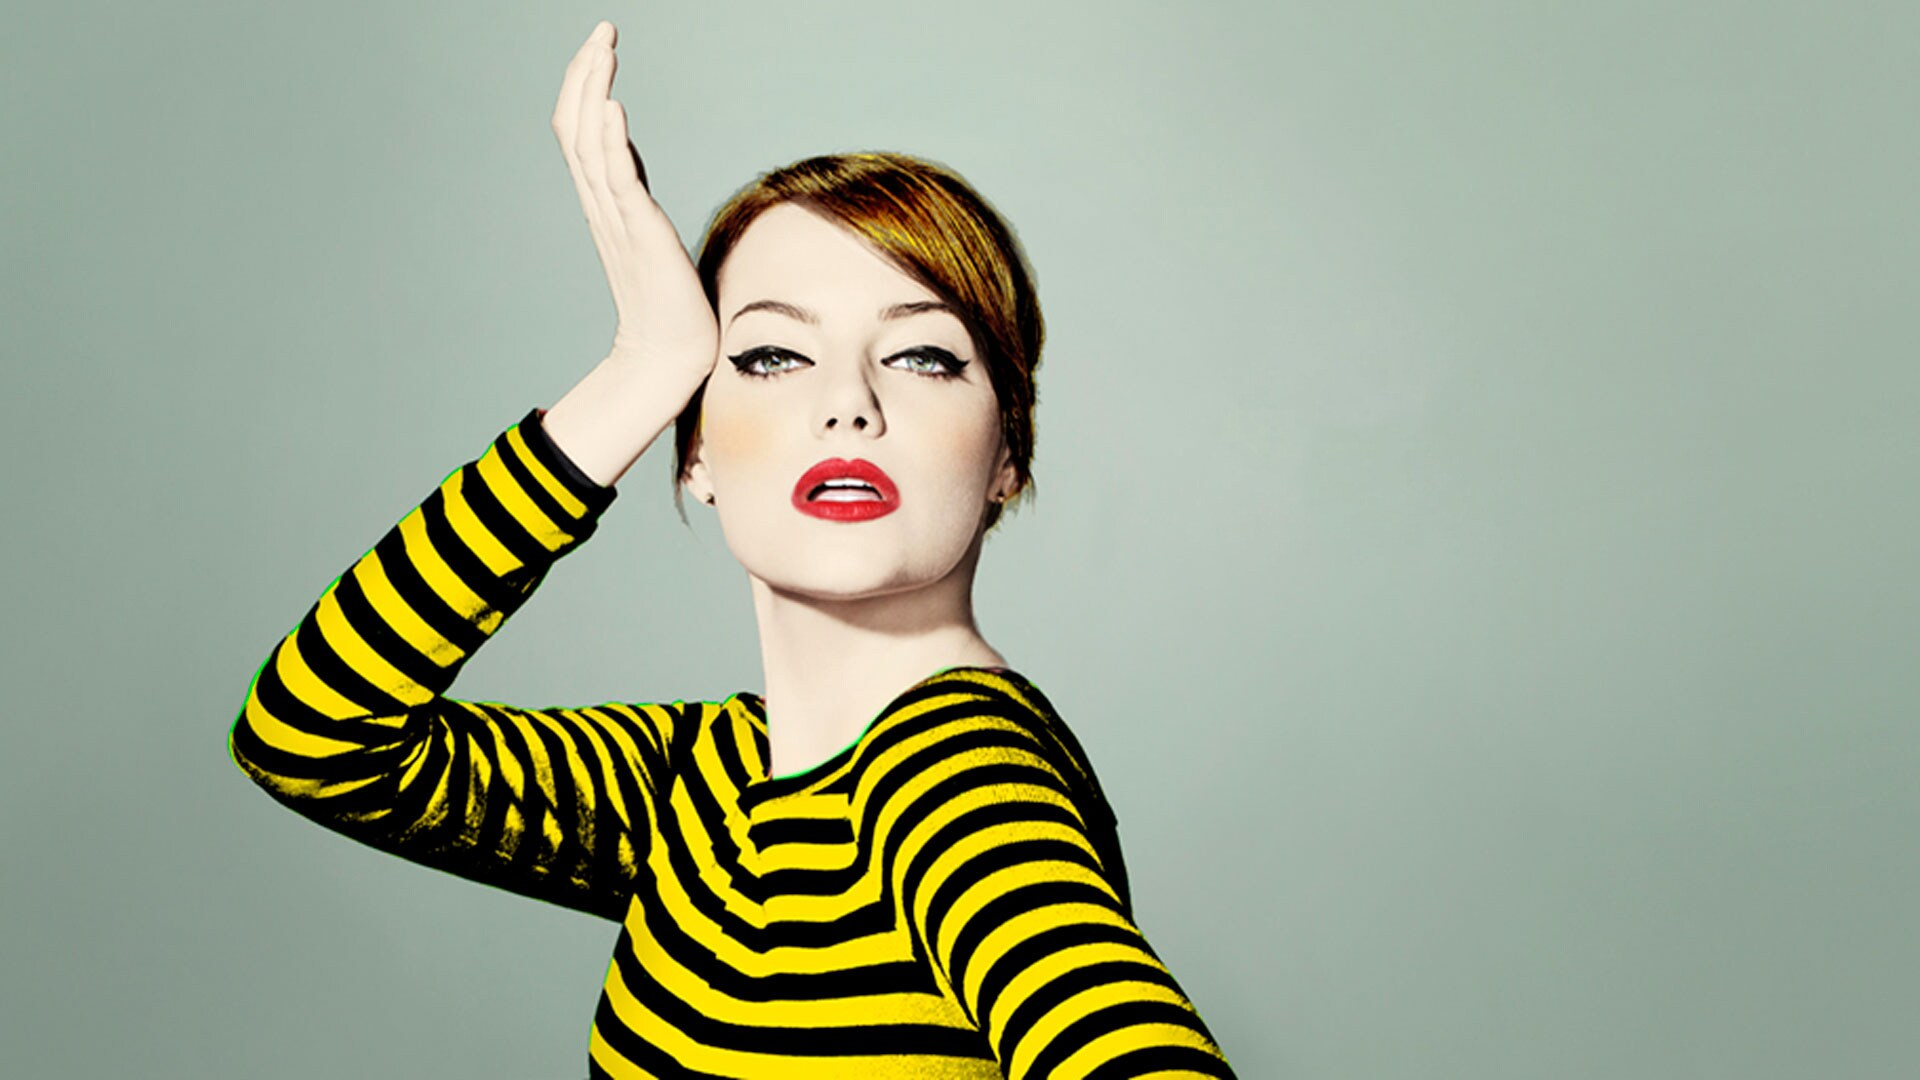 Emma Stone: November 12, 2011